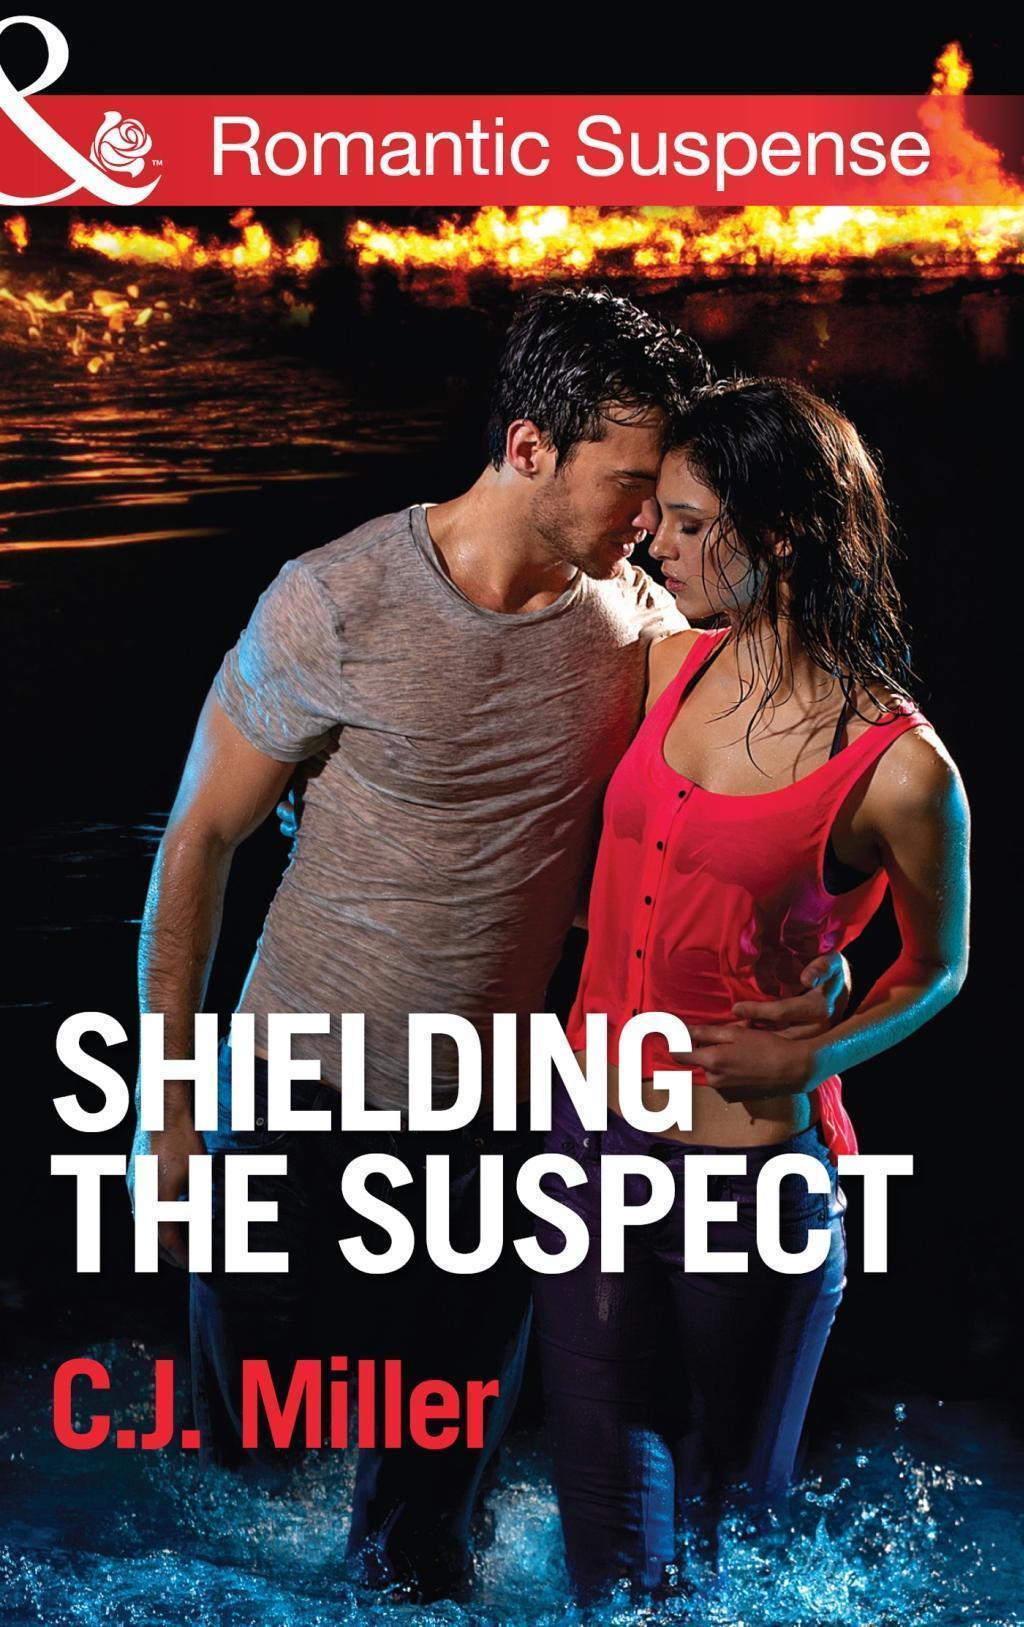 Shielding the Suspect (Mills & Boon Romantic Suspense)